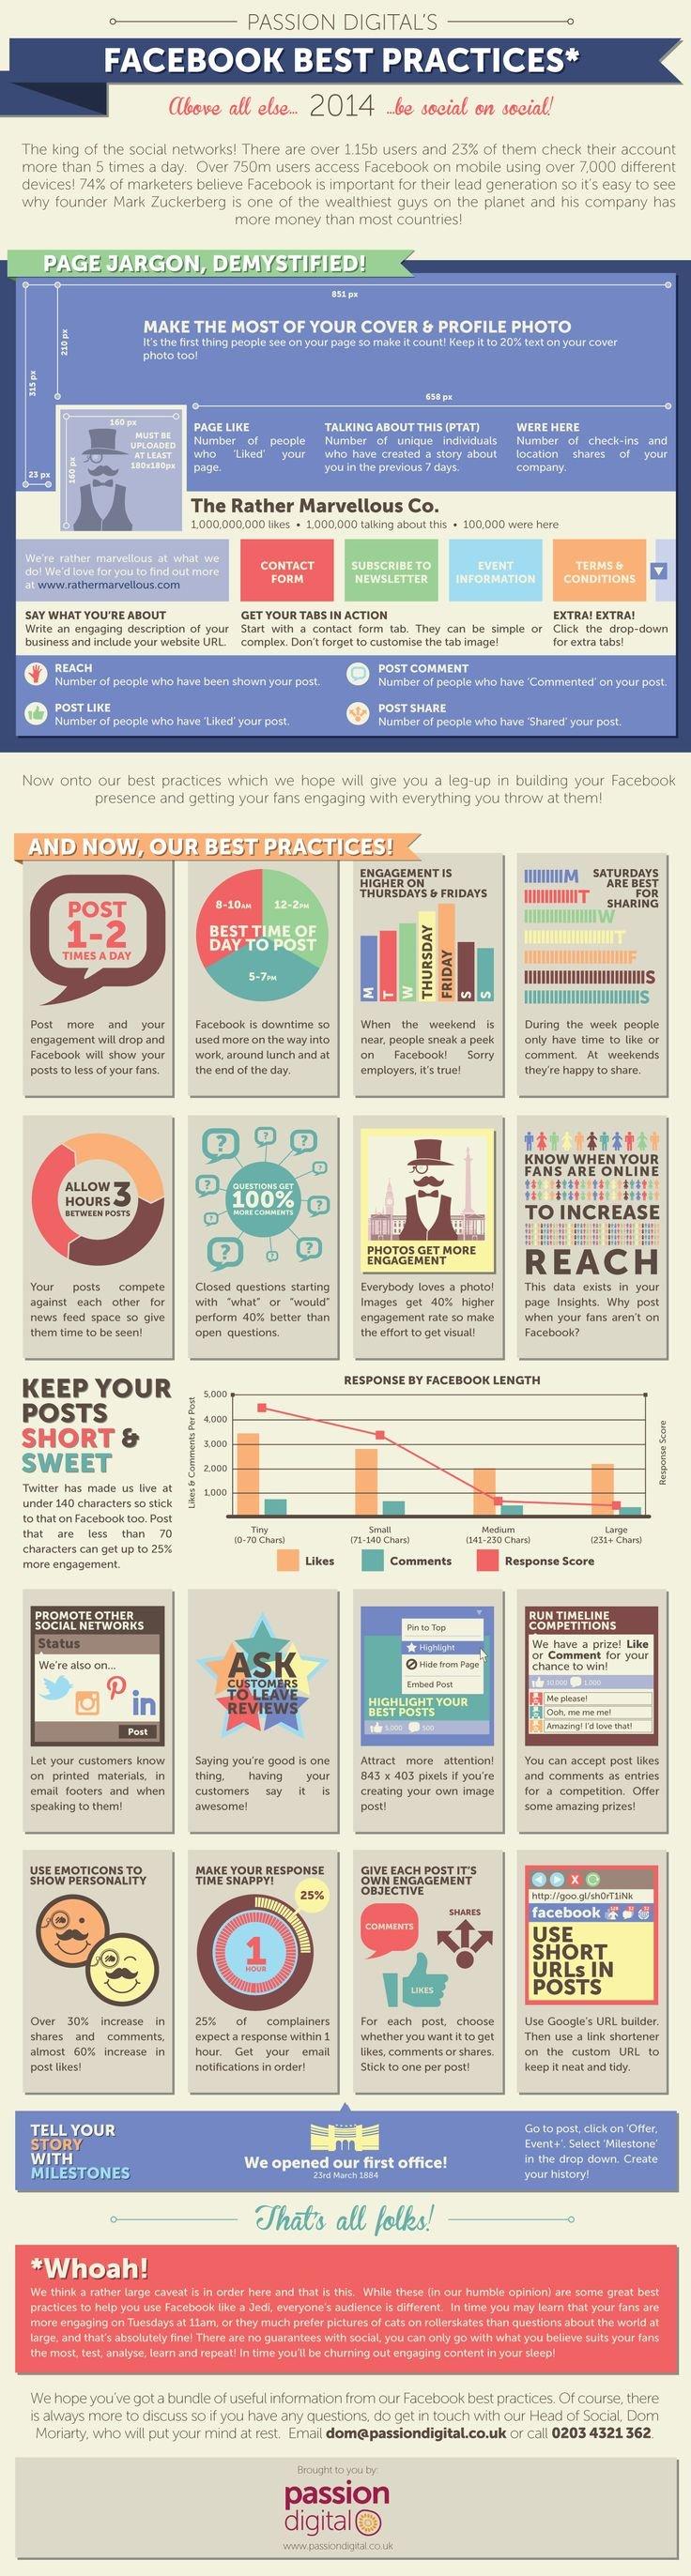 Facebook best practices #infographic